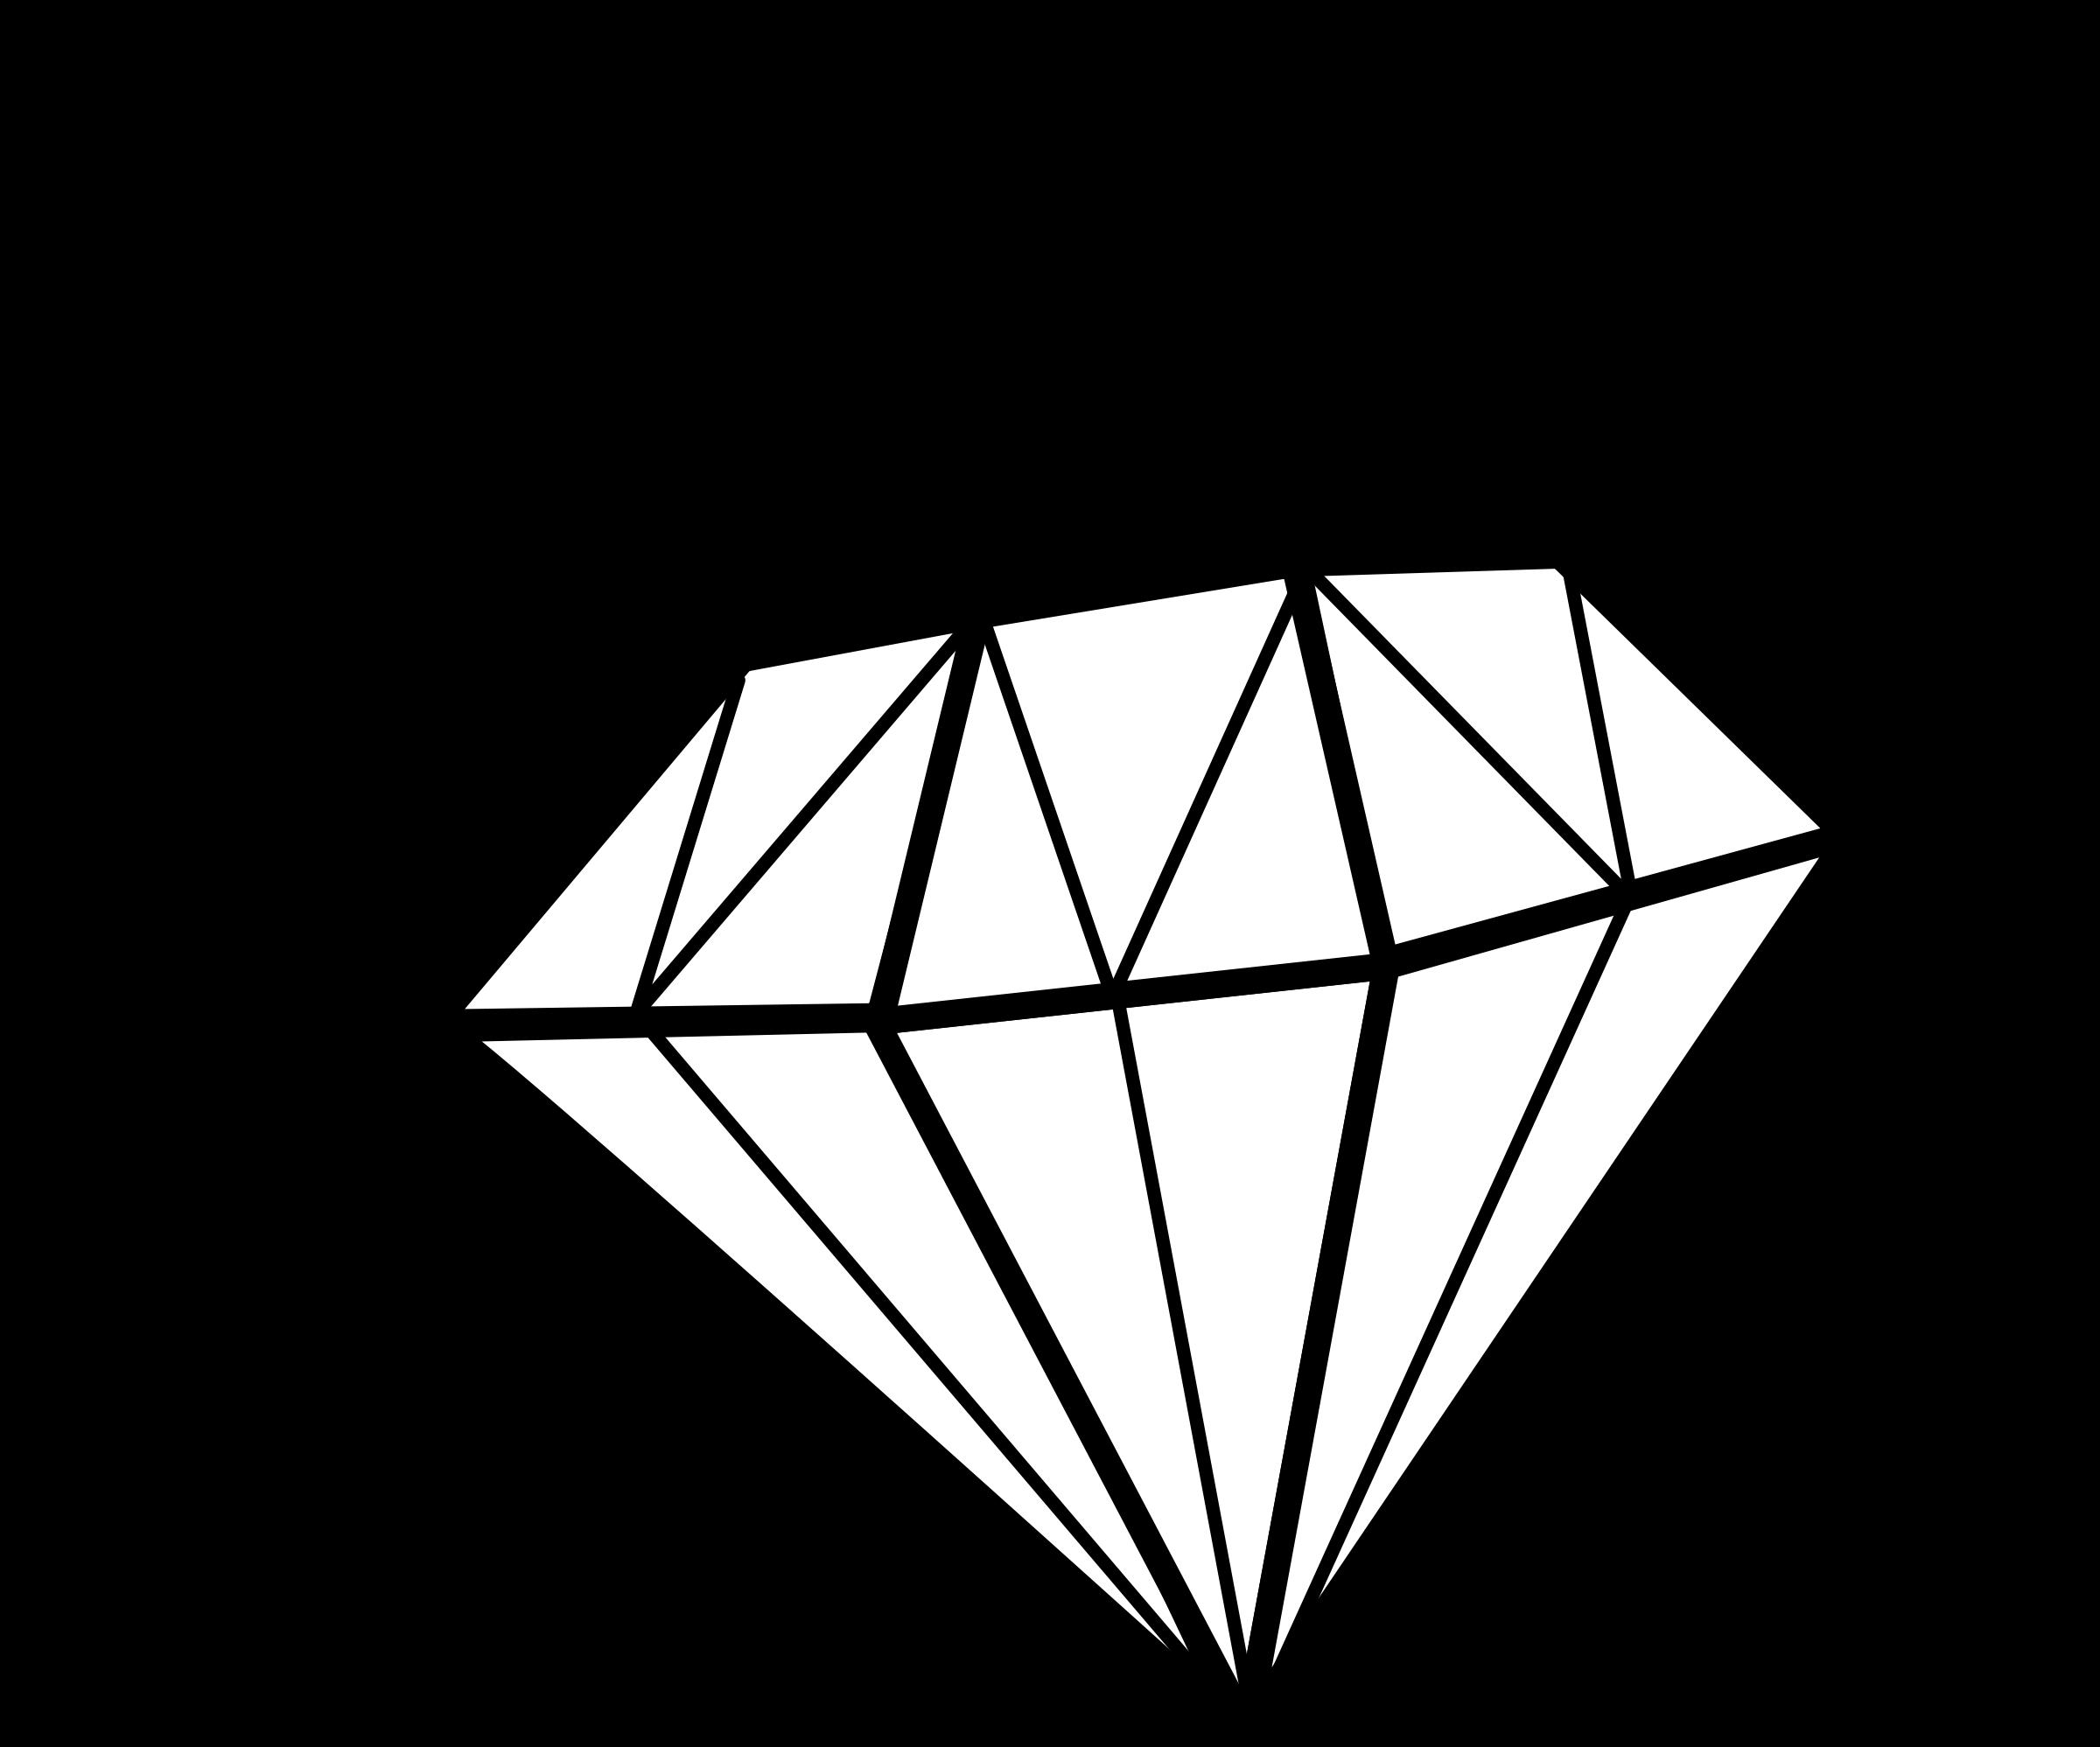 diamond clip art free clipart panda free clipart images rh clipartpanda com diamond clip art outline diamonds clip art free